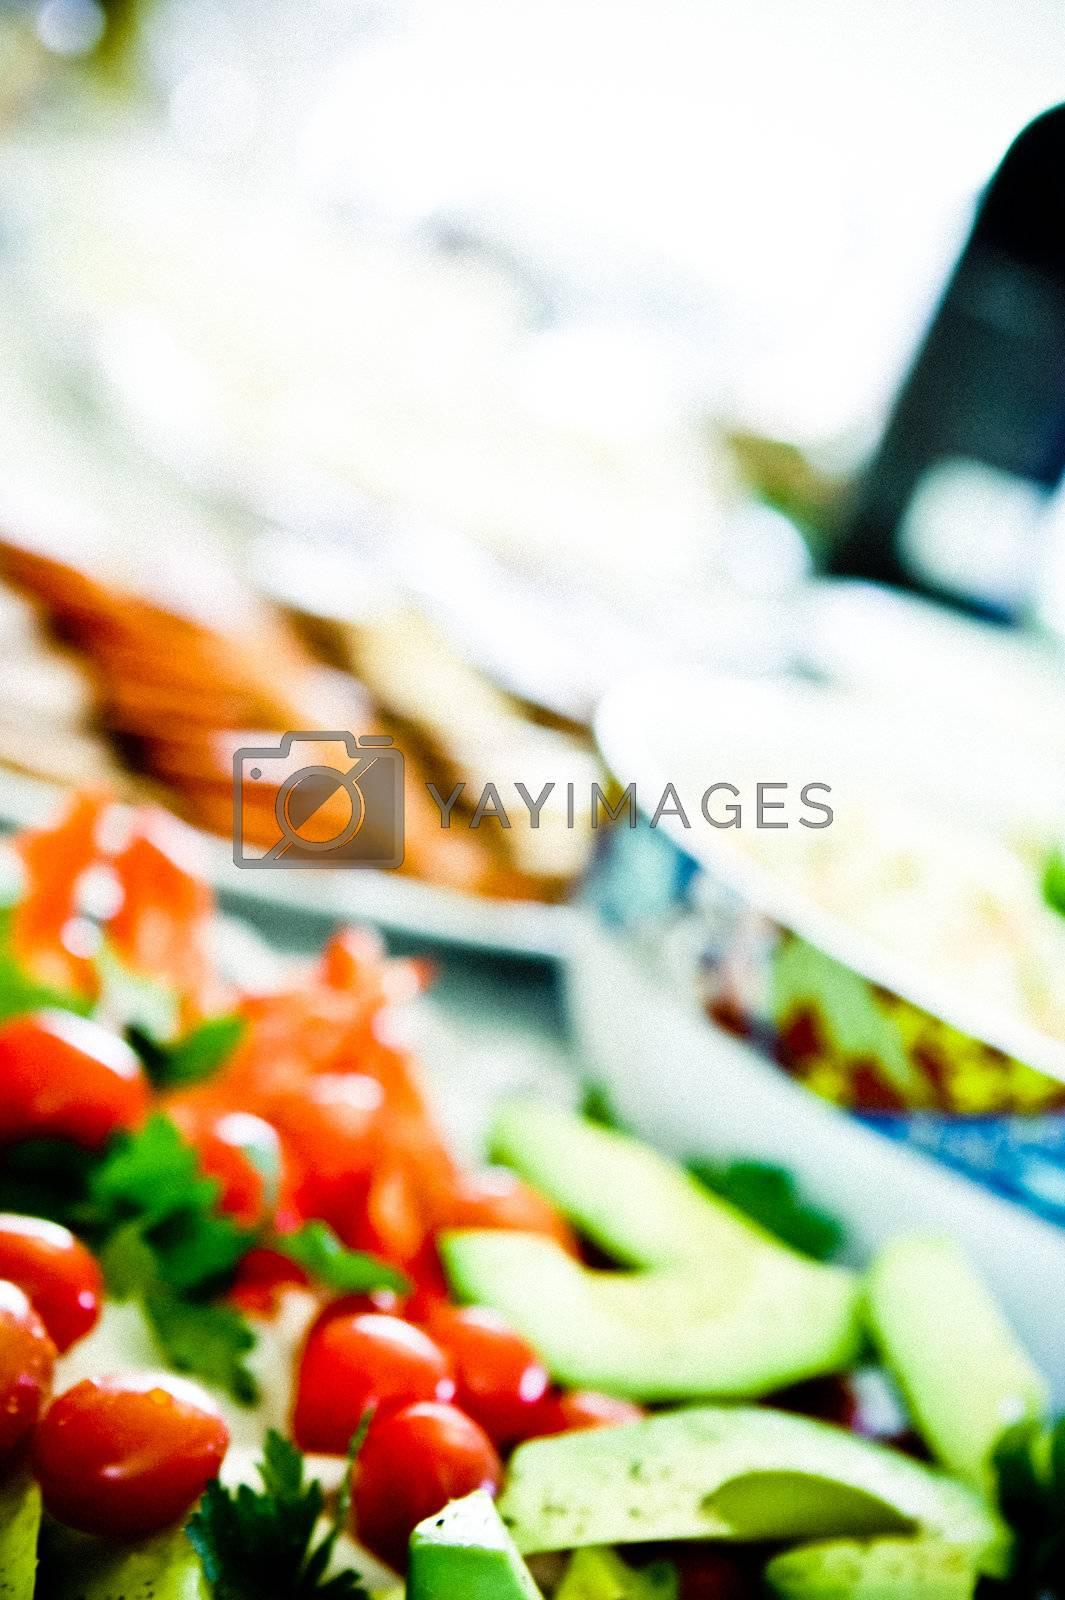 tomatos and avocado on a festive table